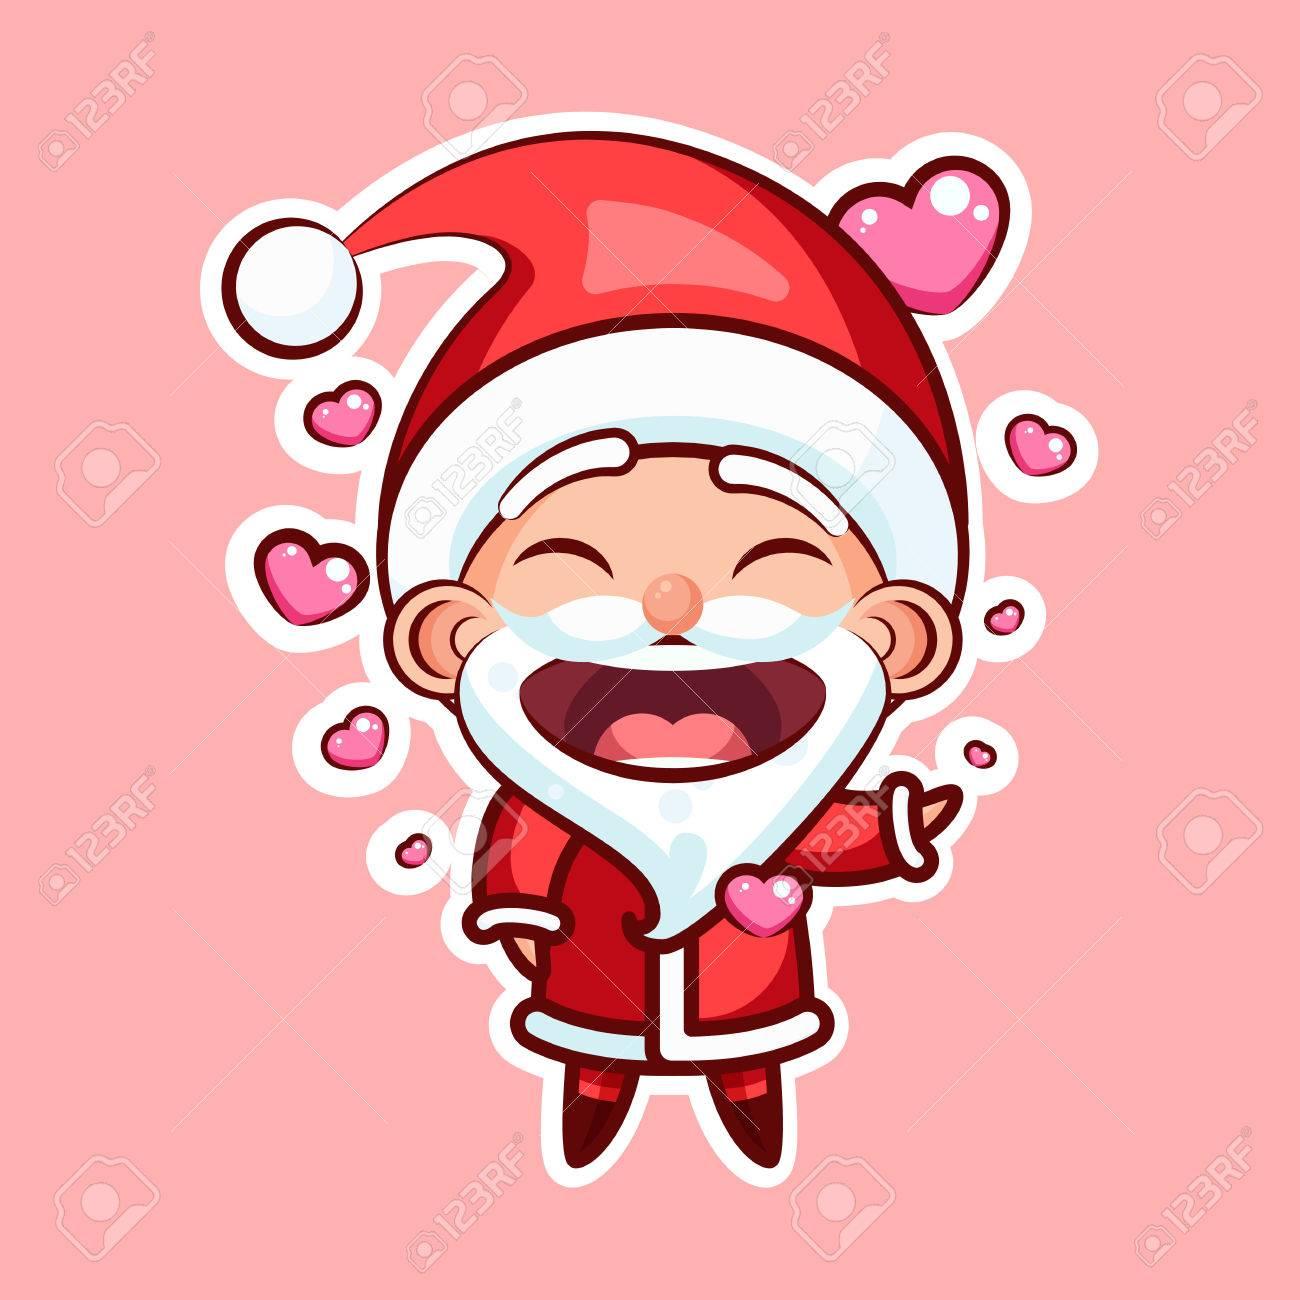 Sticker emoji santa claus royalty free cliparts vectors and sticker emoji santa claus stock vector 85581912 biocorpaavc Image collections